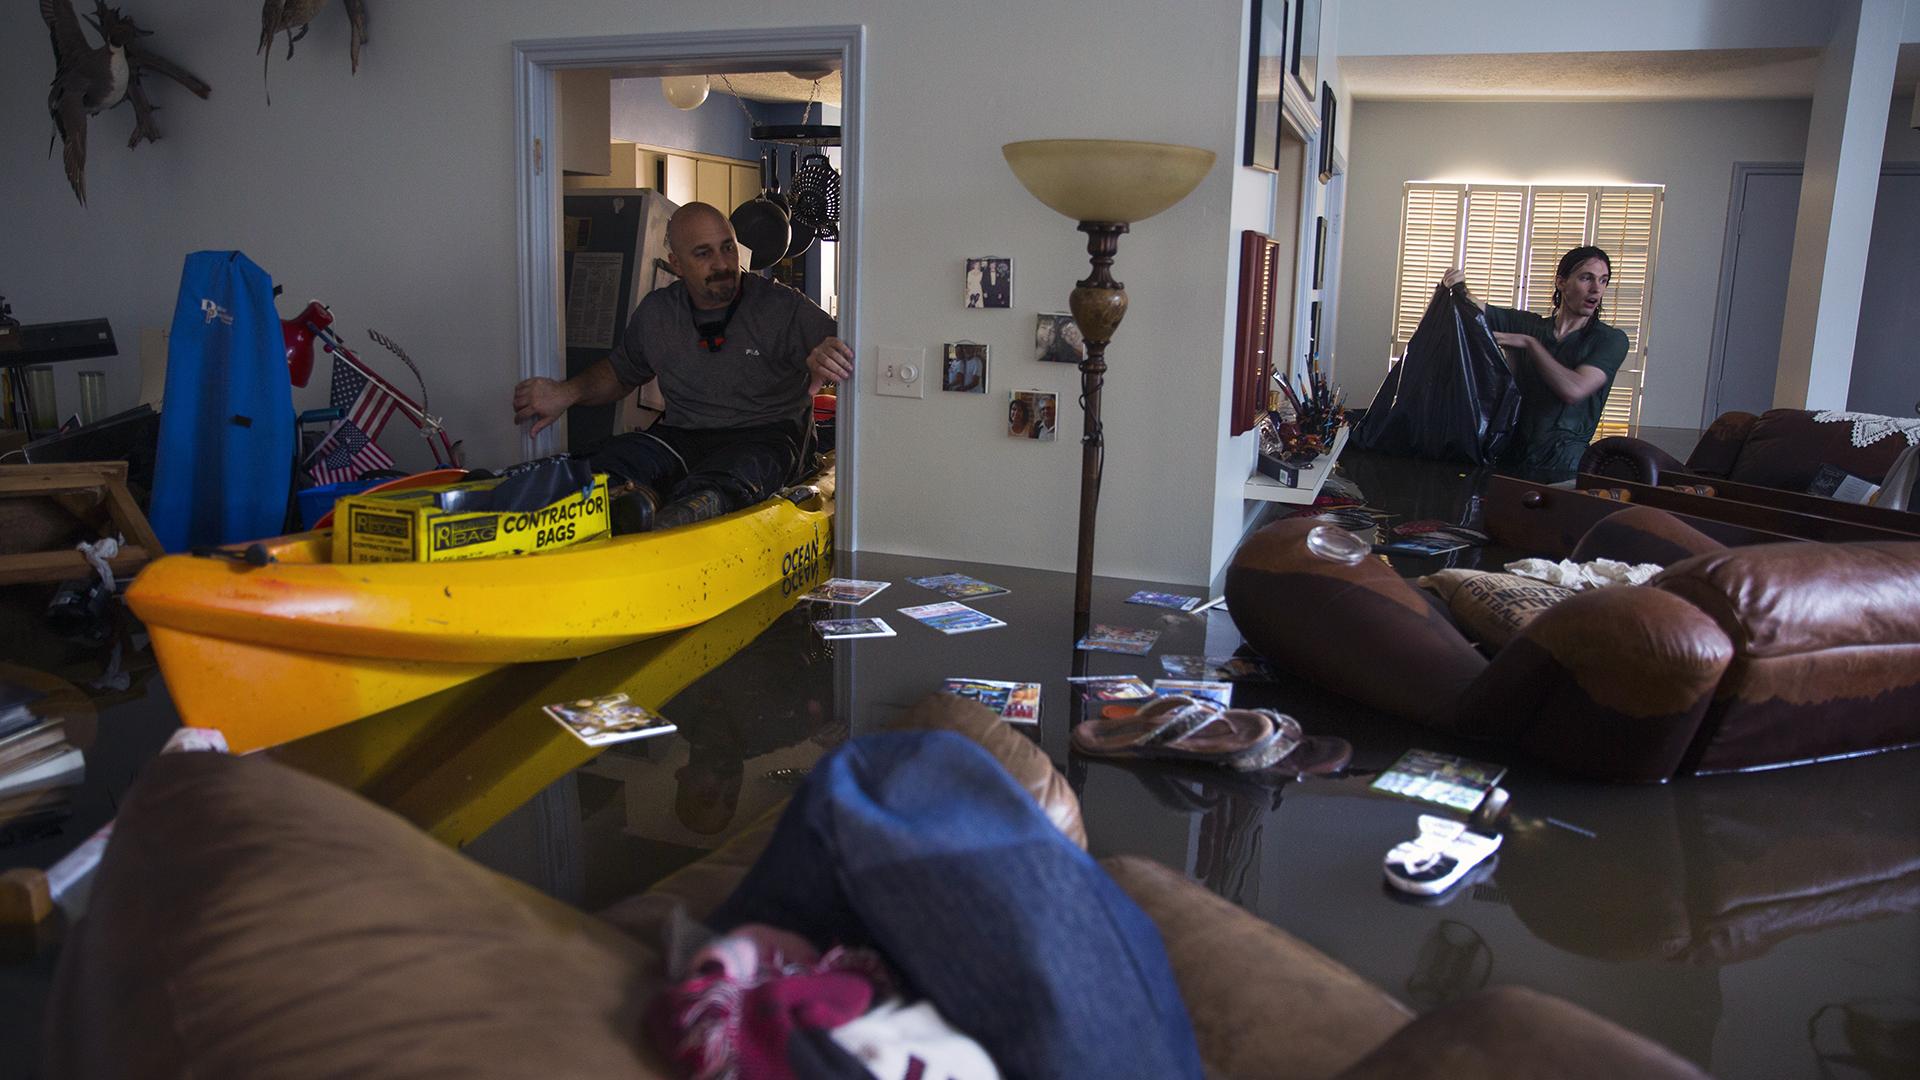 Hurricane Harvey floodwater in home-159532.jpg47644652